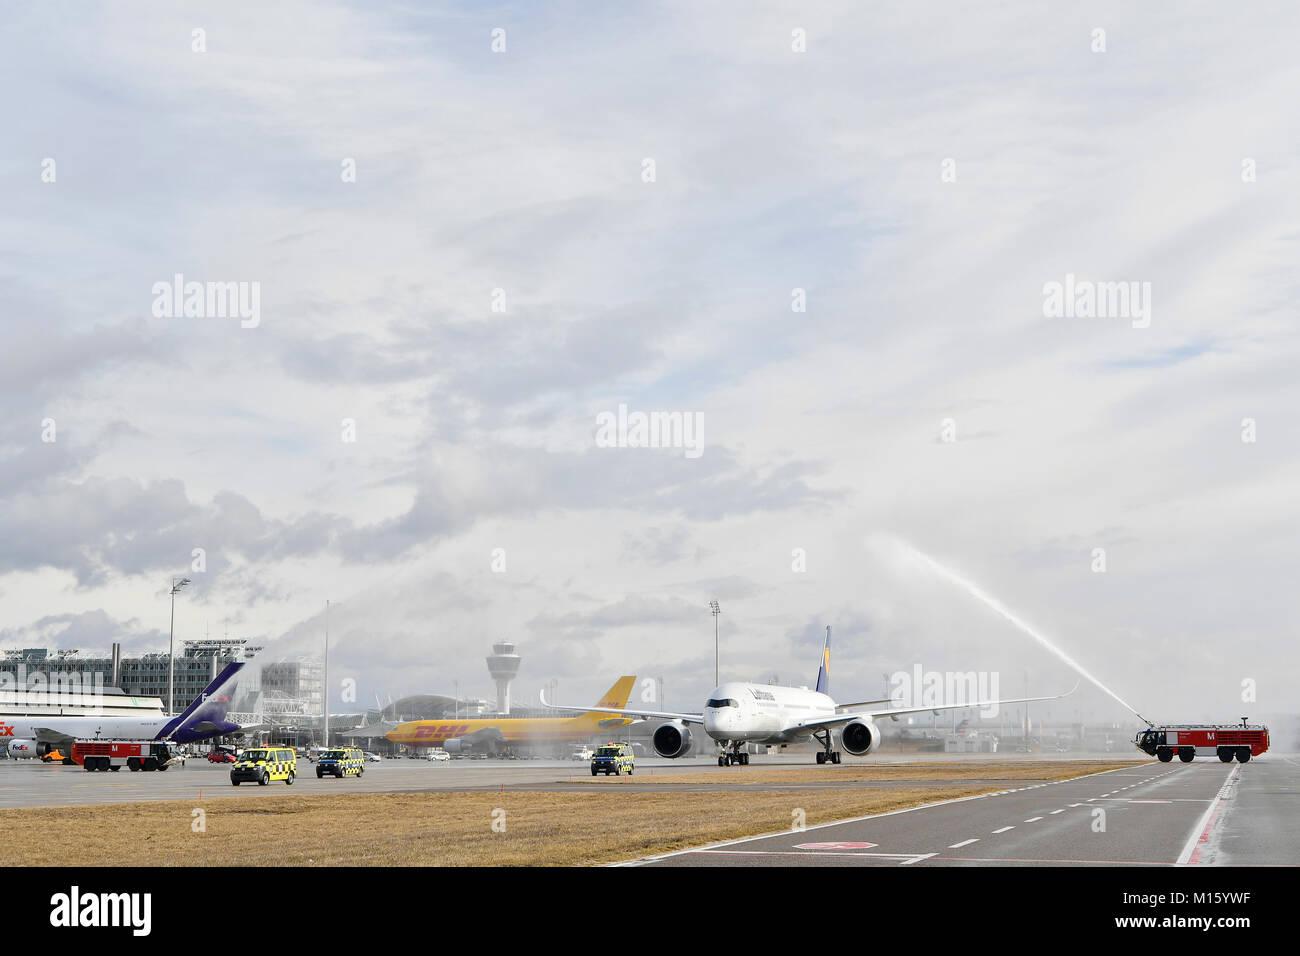 Water christening,maiden flight,Lufthansa Airbus A 350-900,Munich Airport,Upper Bavaria,Germany - Stock Image